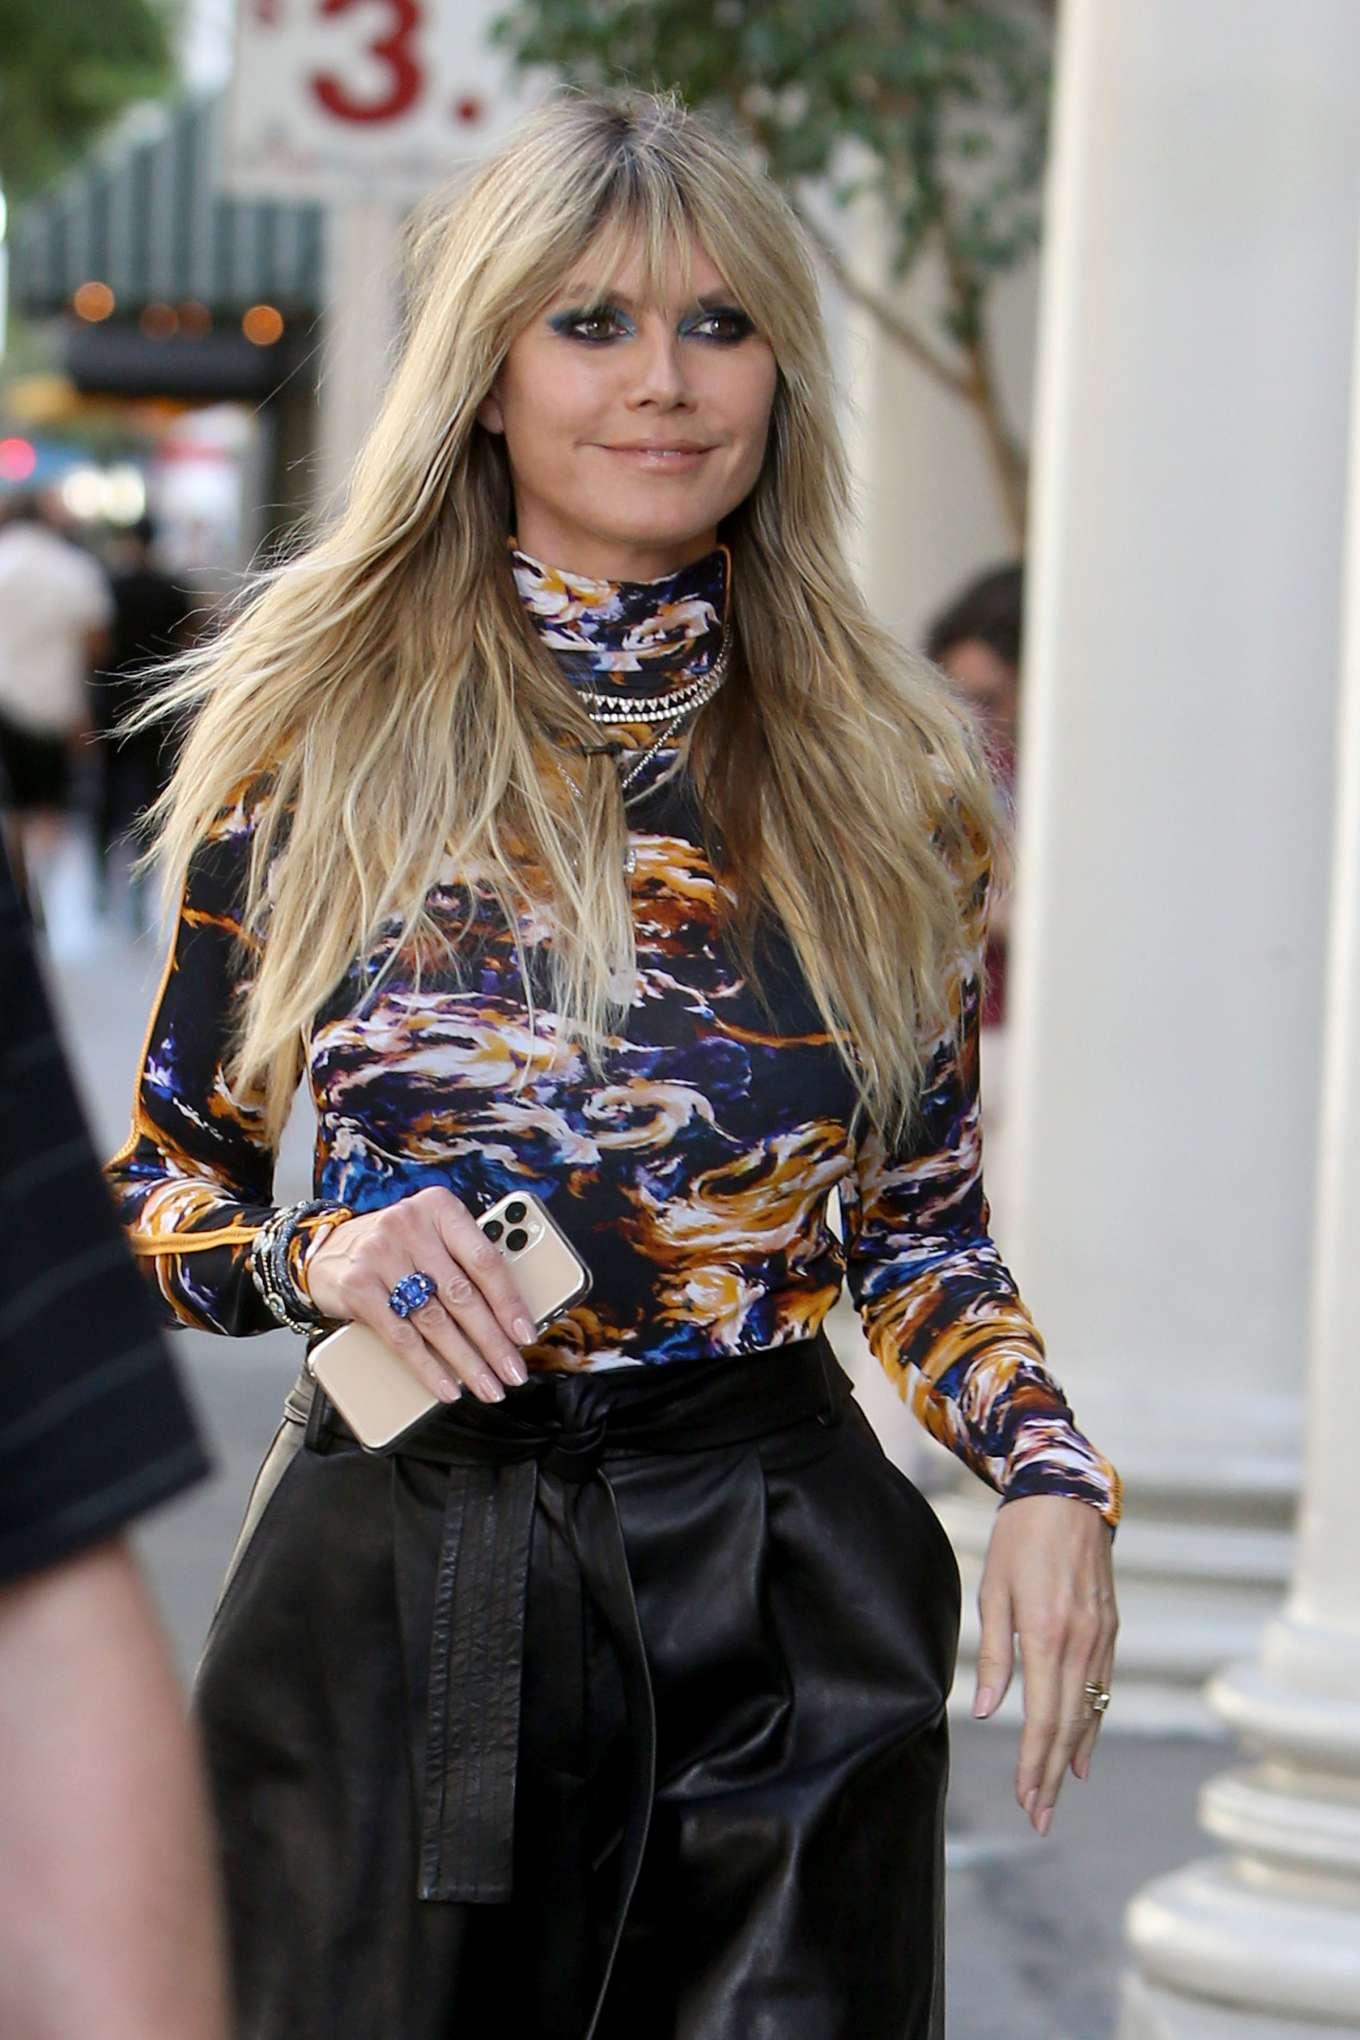 Heidi Klum - Arrives to the 'Germany's Next Topmodel' Set in LA